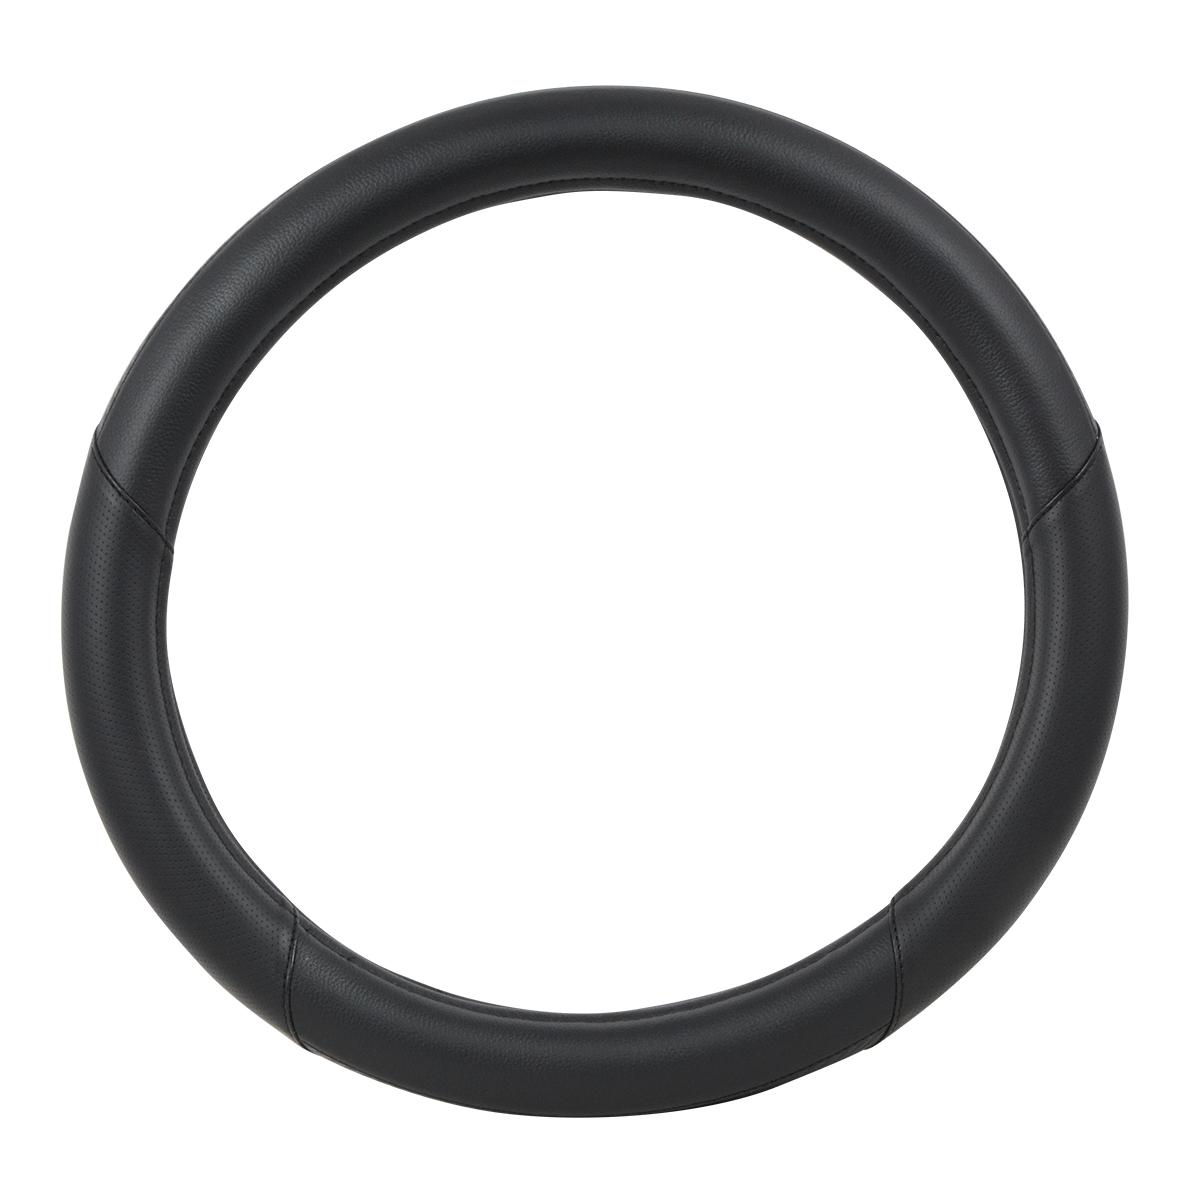 "54067 Heavy Duty 18"" Steering Wheel Cover in Deluxe Matte Carbon Fiber"